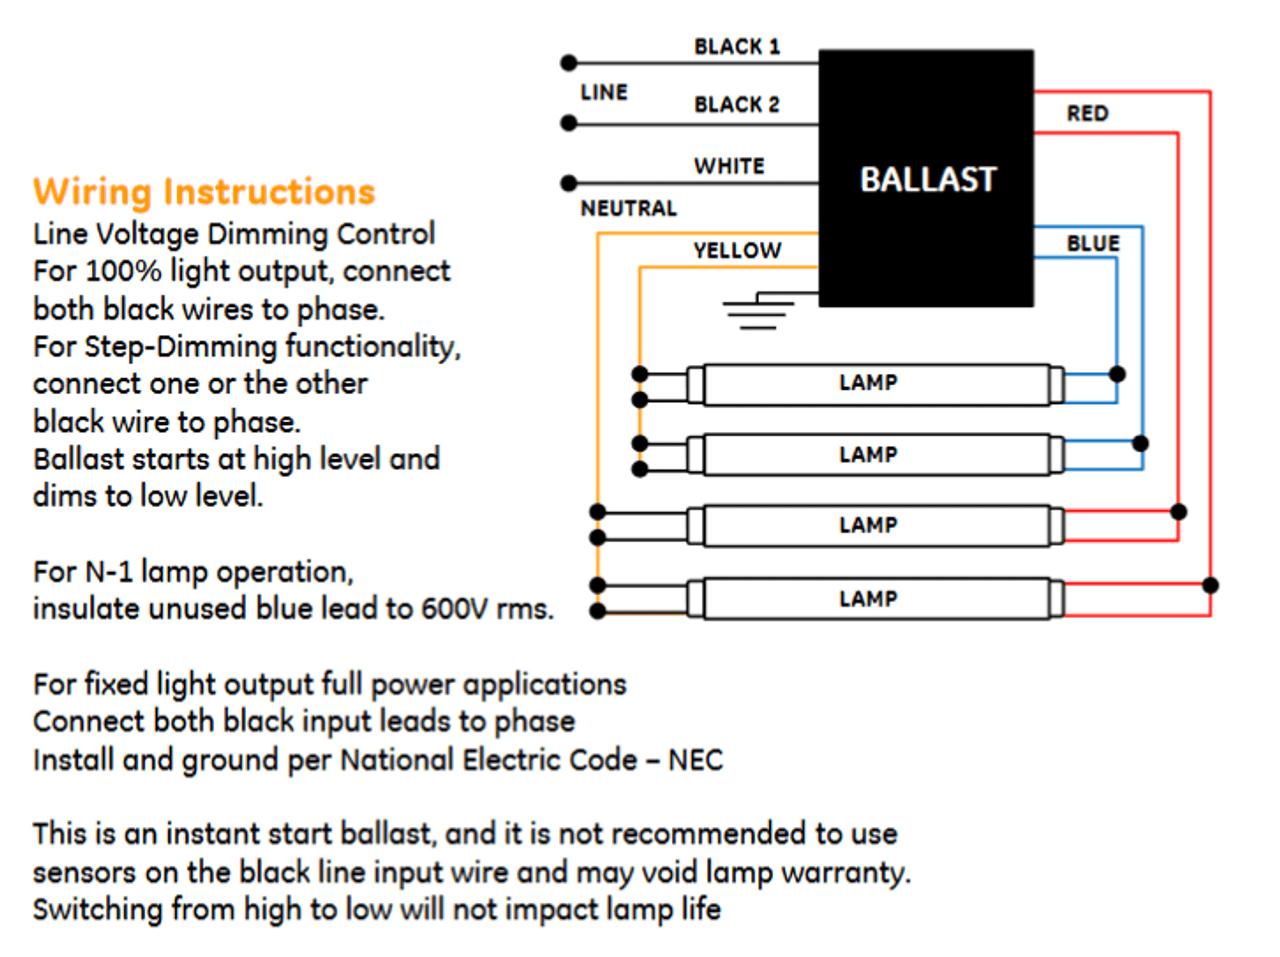 ge stepped dimming ballast wiring diagram another wiring diagram bi level dimming wiring diagram [ 1280 x 957 Pixel ]